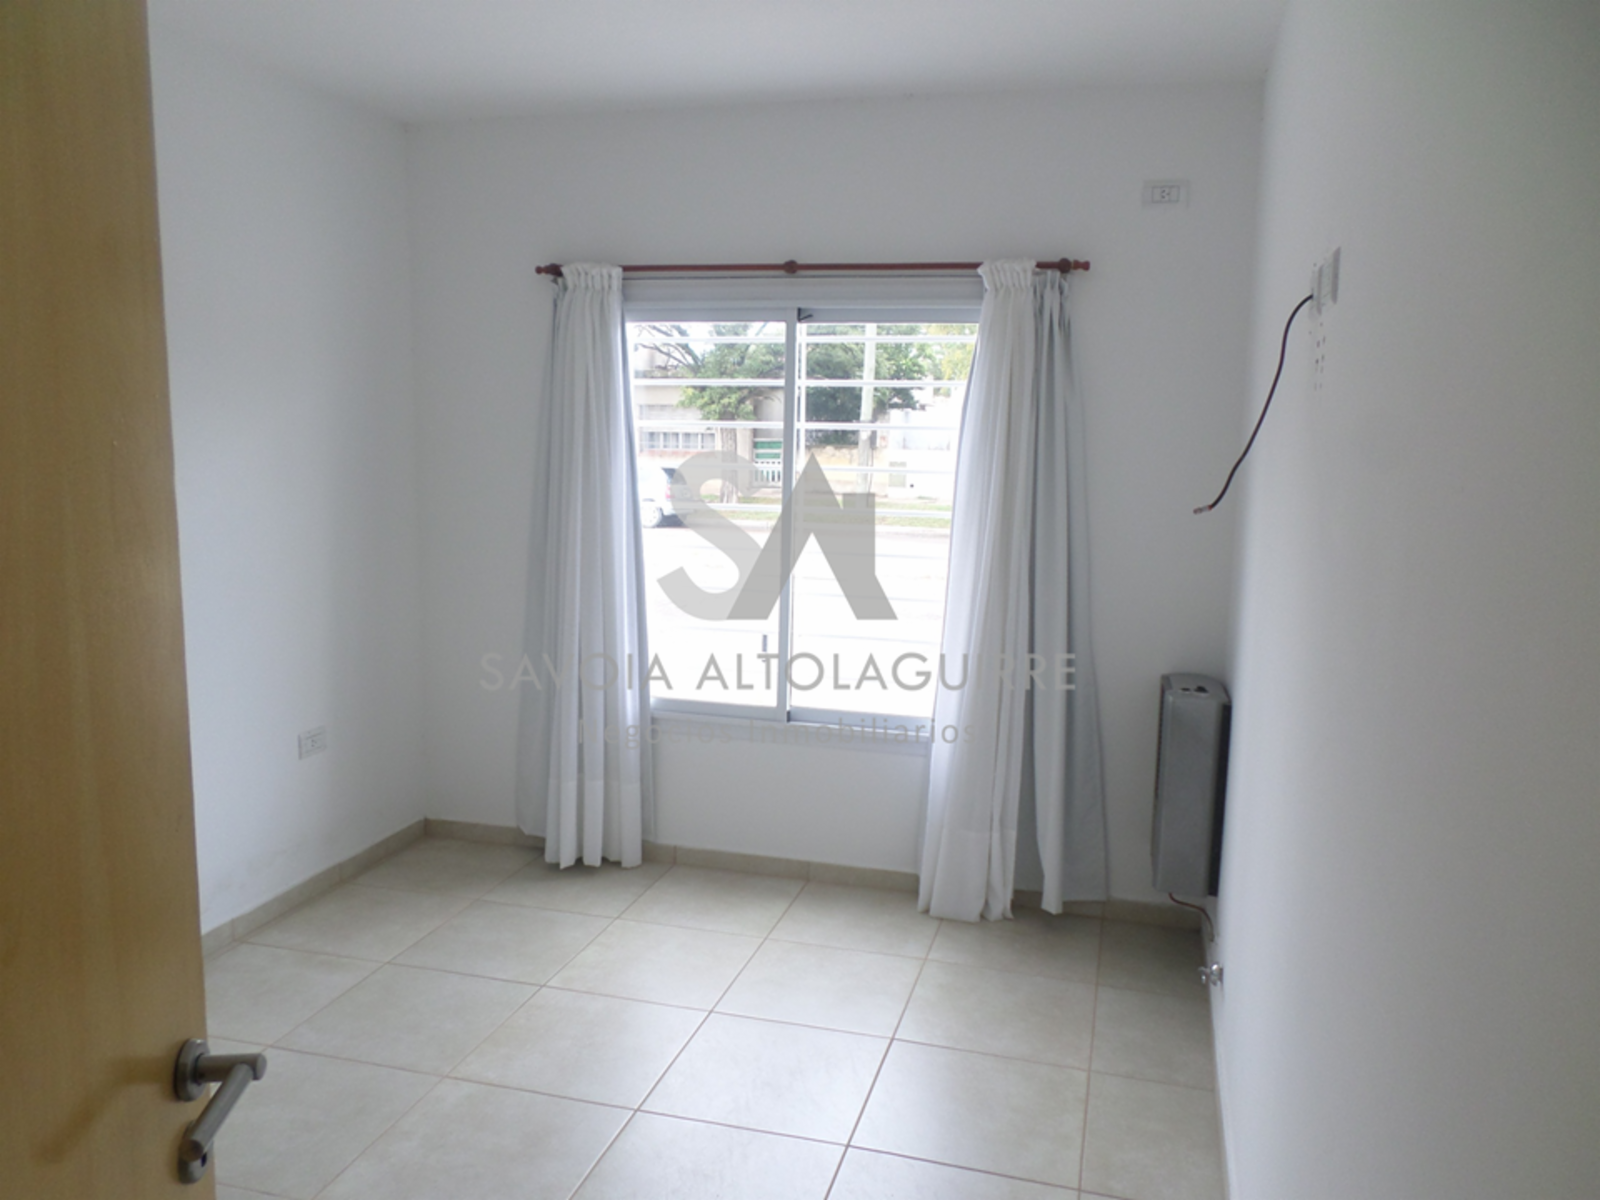 ALQUILA: DEPARTAMENTO 1 DORMITORIO S/AVENIDA EDISON, Savoia Altolaguirre Negocios Inmobiliarios